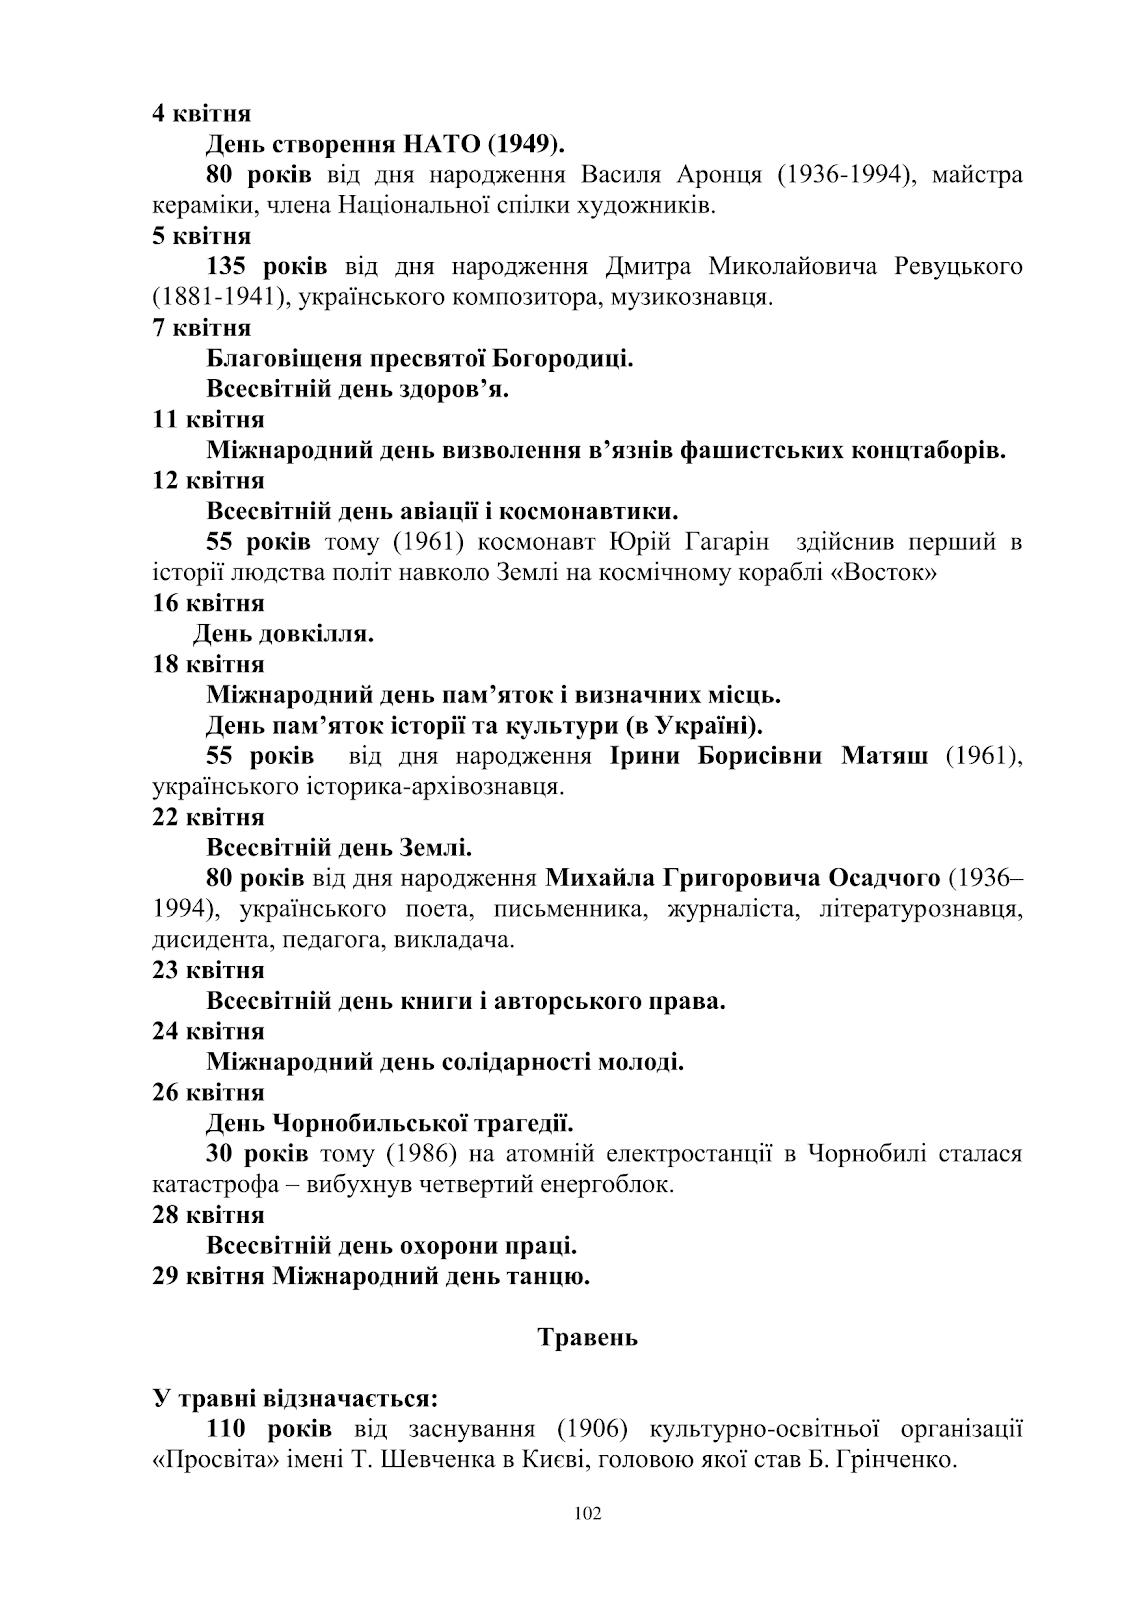 C:\Users\Валерия\Desktop\план 2016 рік\план 2016 рік-102.png